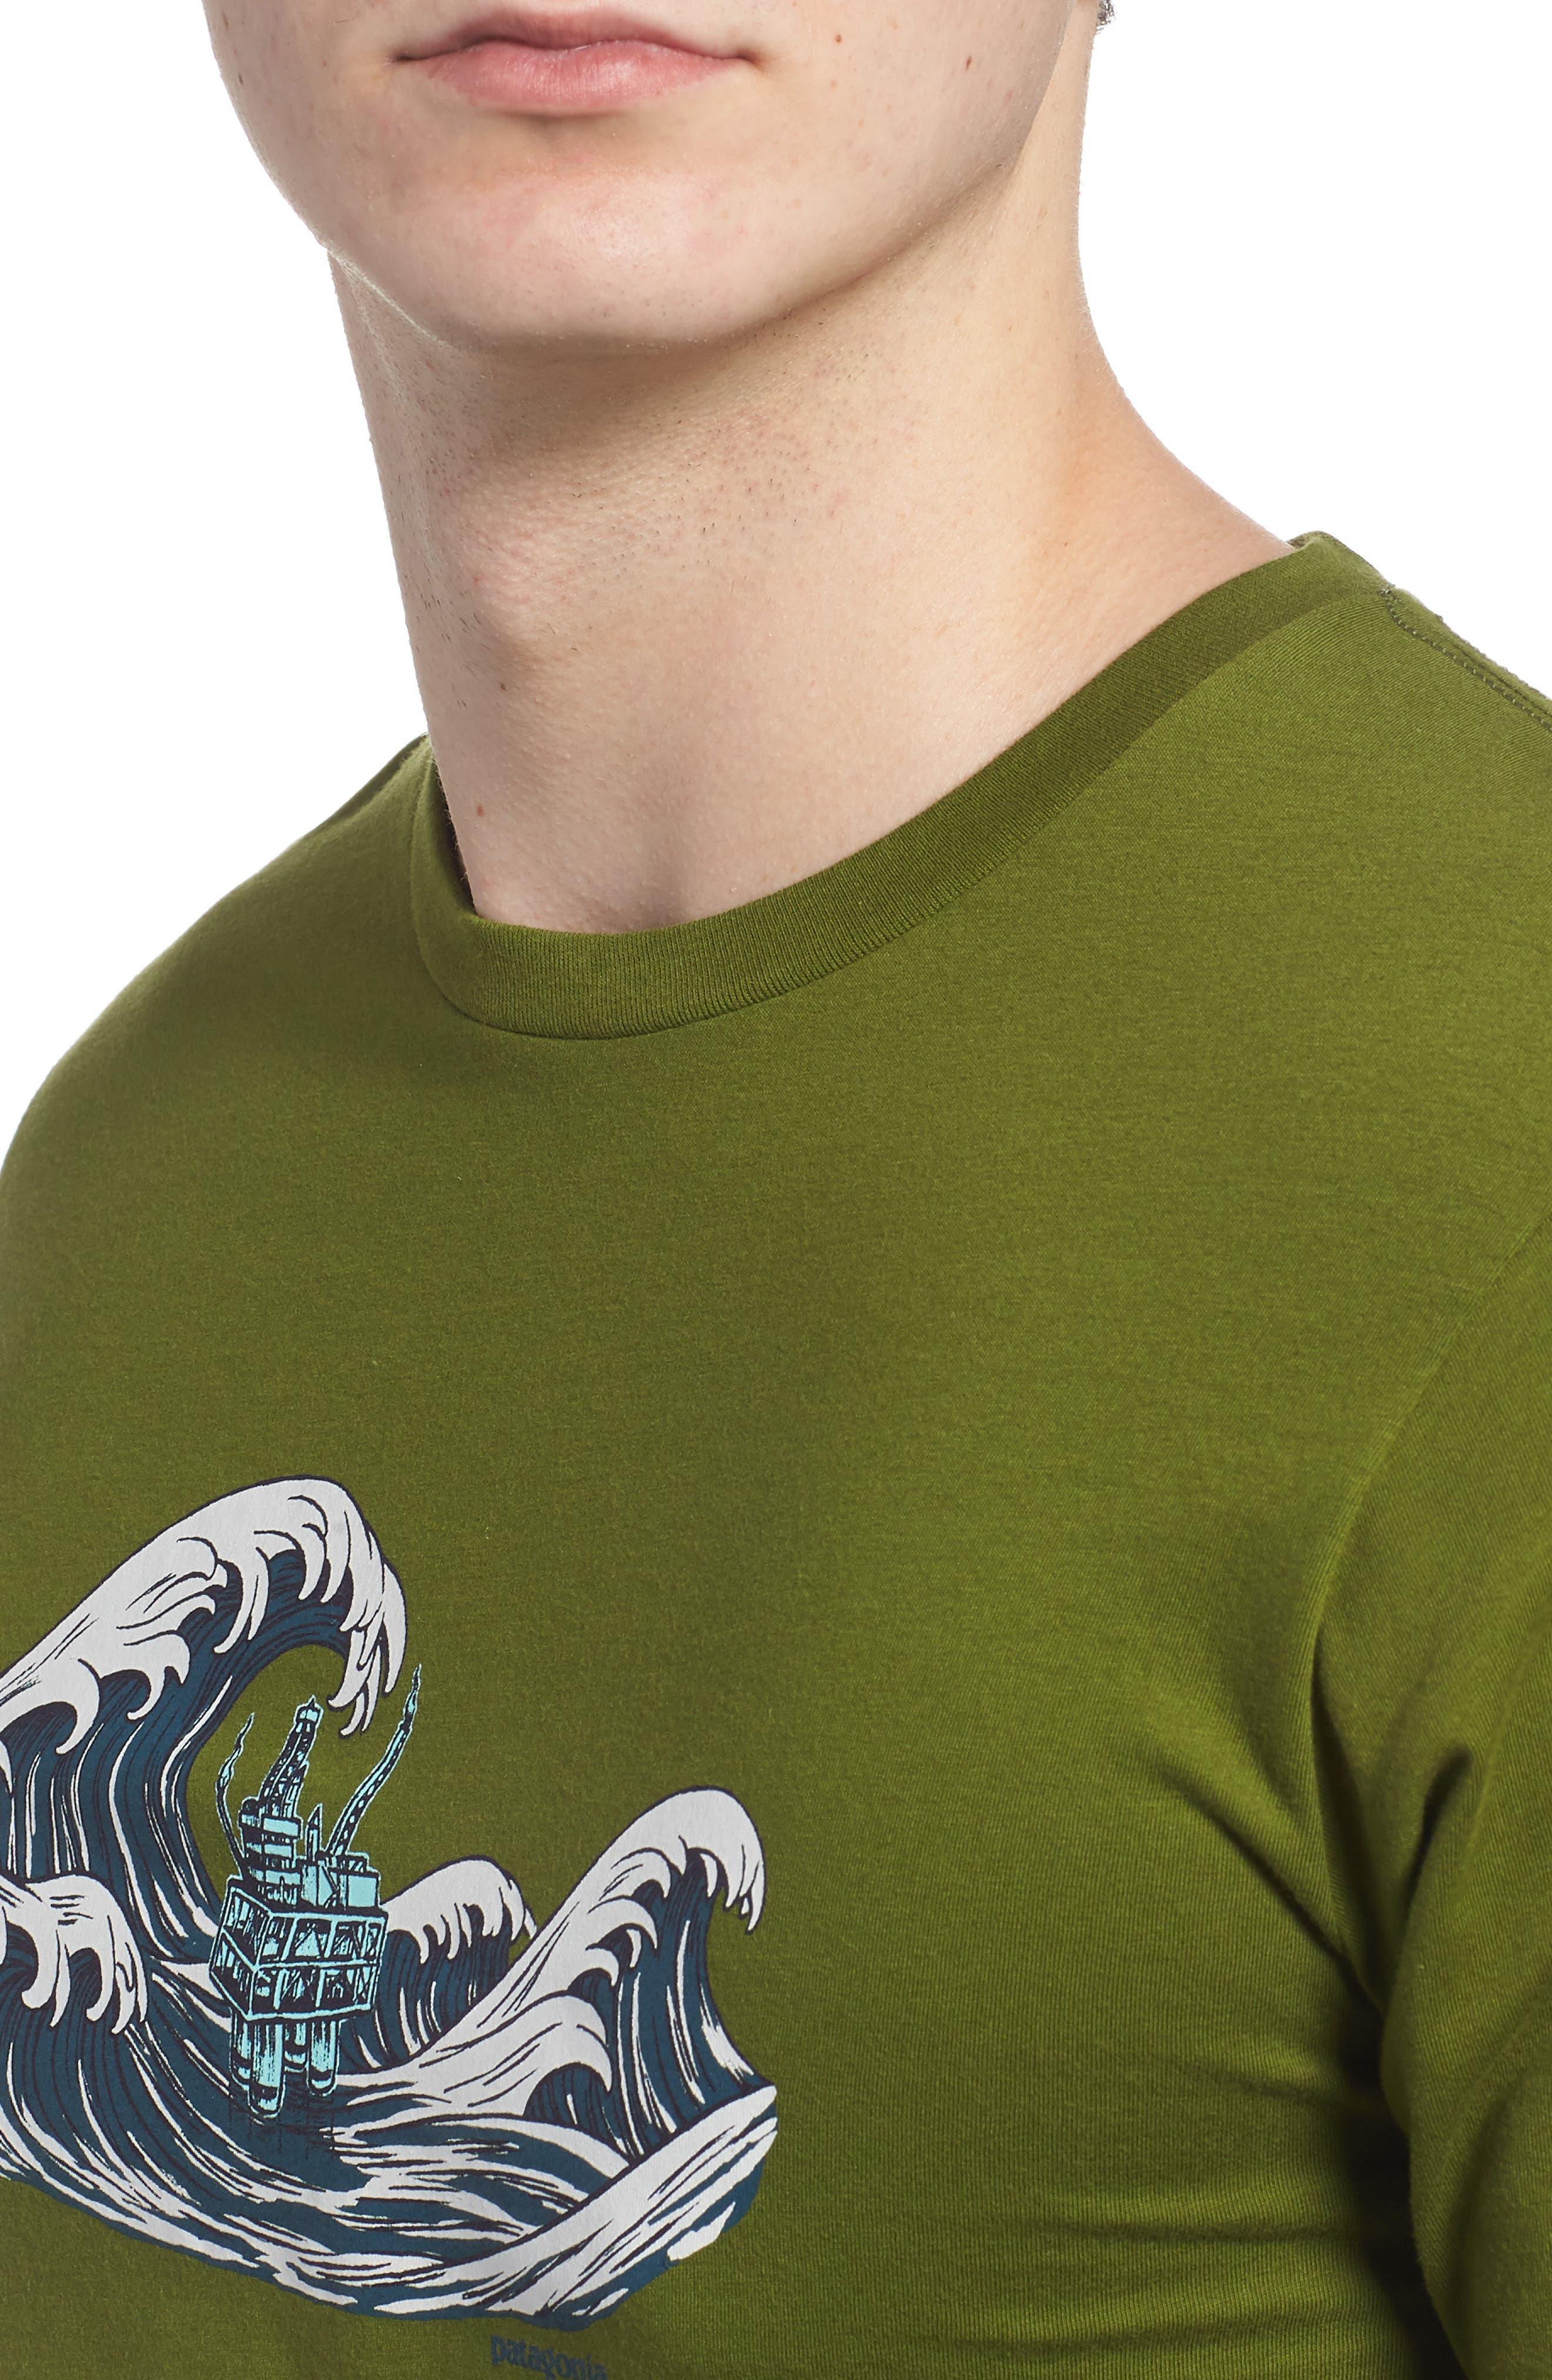 PATAGONIA,                             Oily Olas Slim Fit Organic Cotton T-Shirt,                             Alternate thumbnail 4, color,                             300